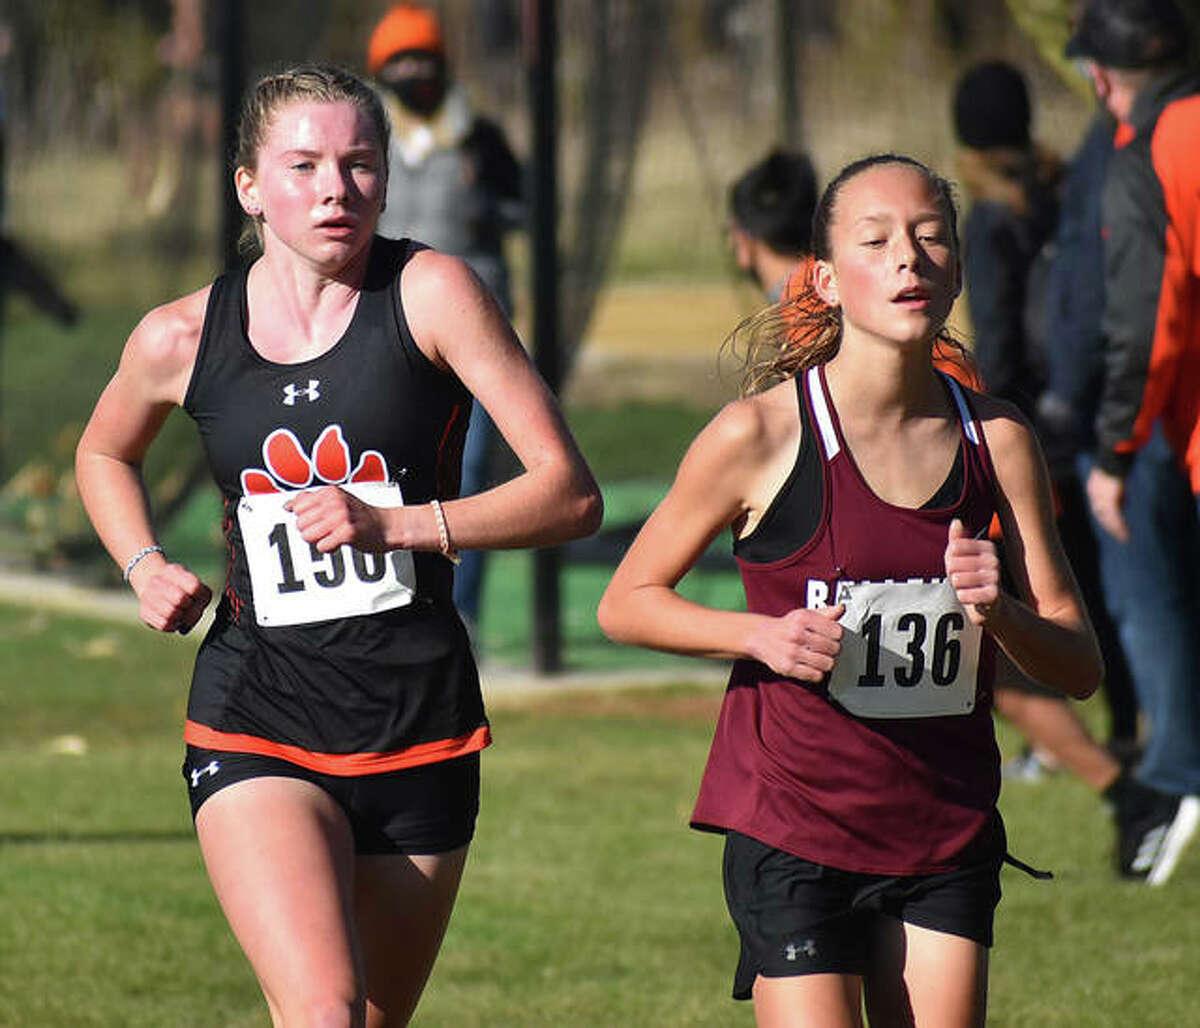 Edwardsville sophomore Riley Knoyle, left, runs alongside Belleville West's Alyssa Elliott during the Class 3A Normal Community Sectional on Saturday.